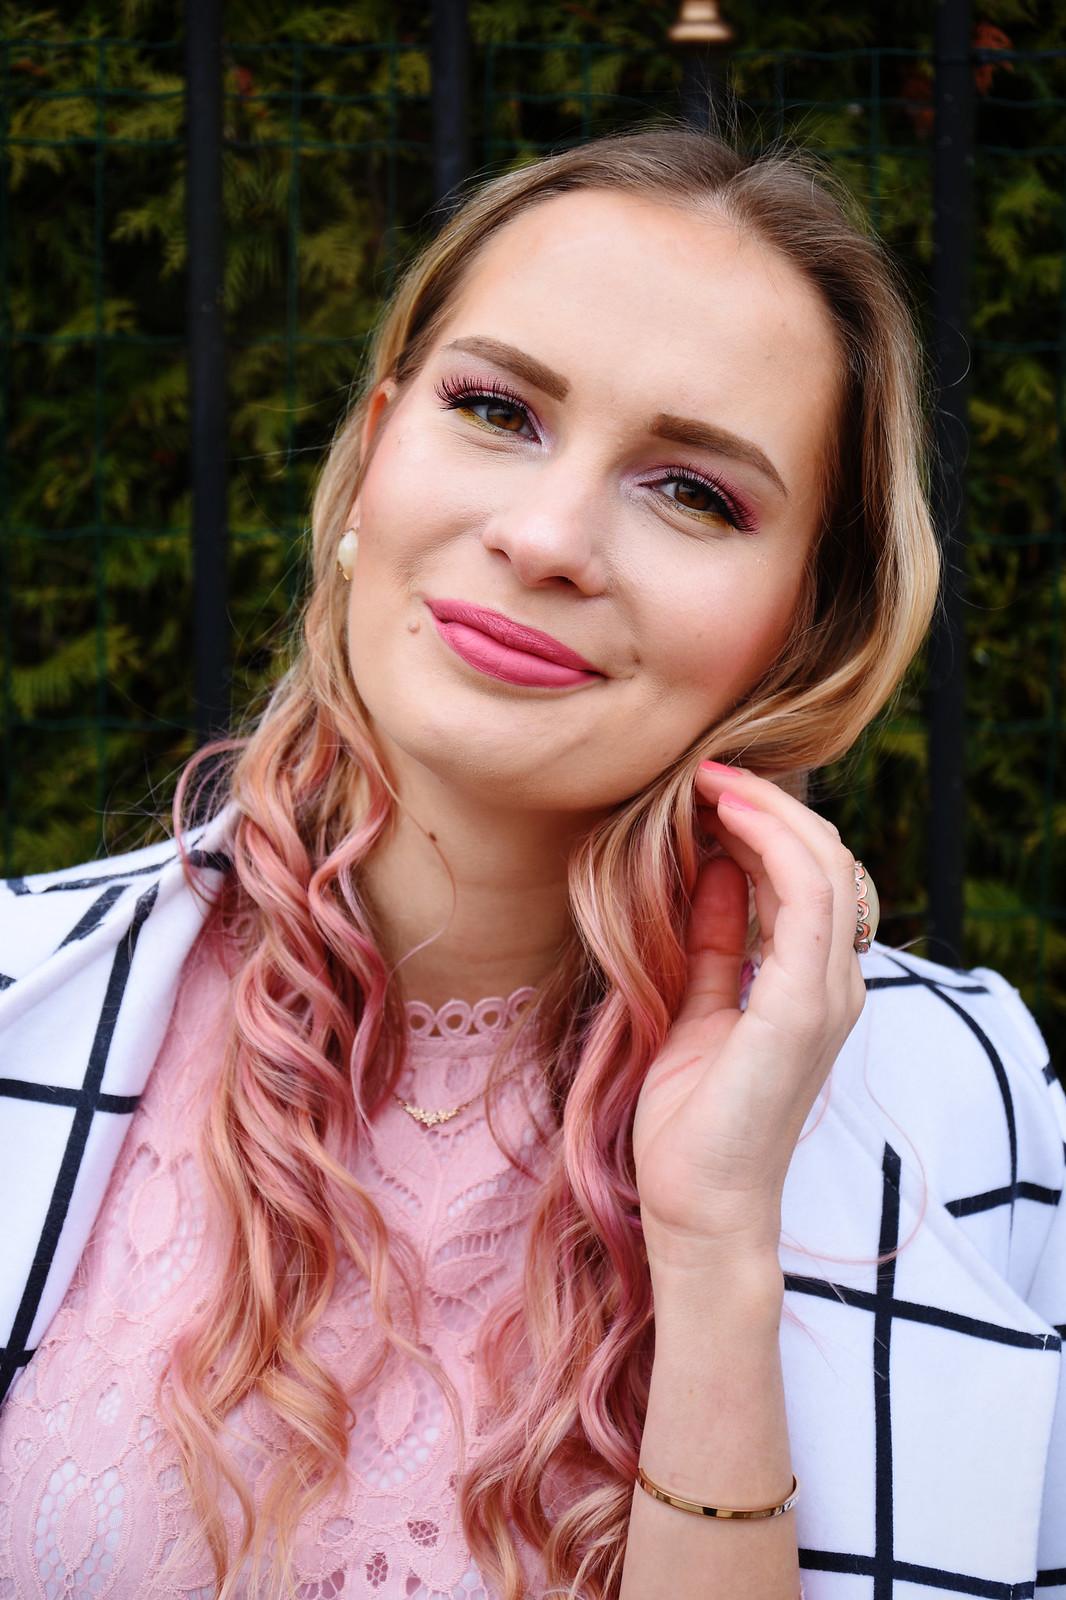 L'Oreal Colorista hot pink hair colour